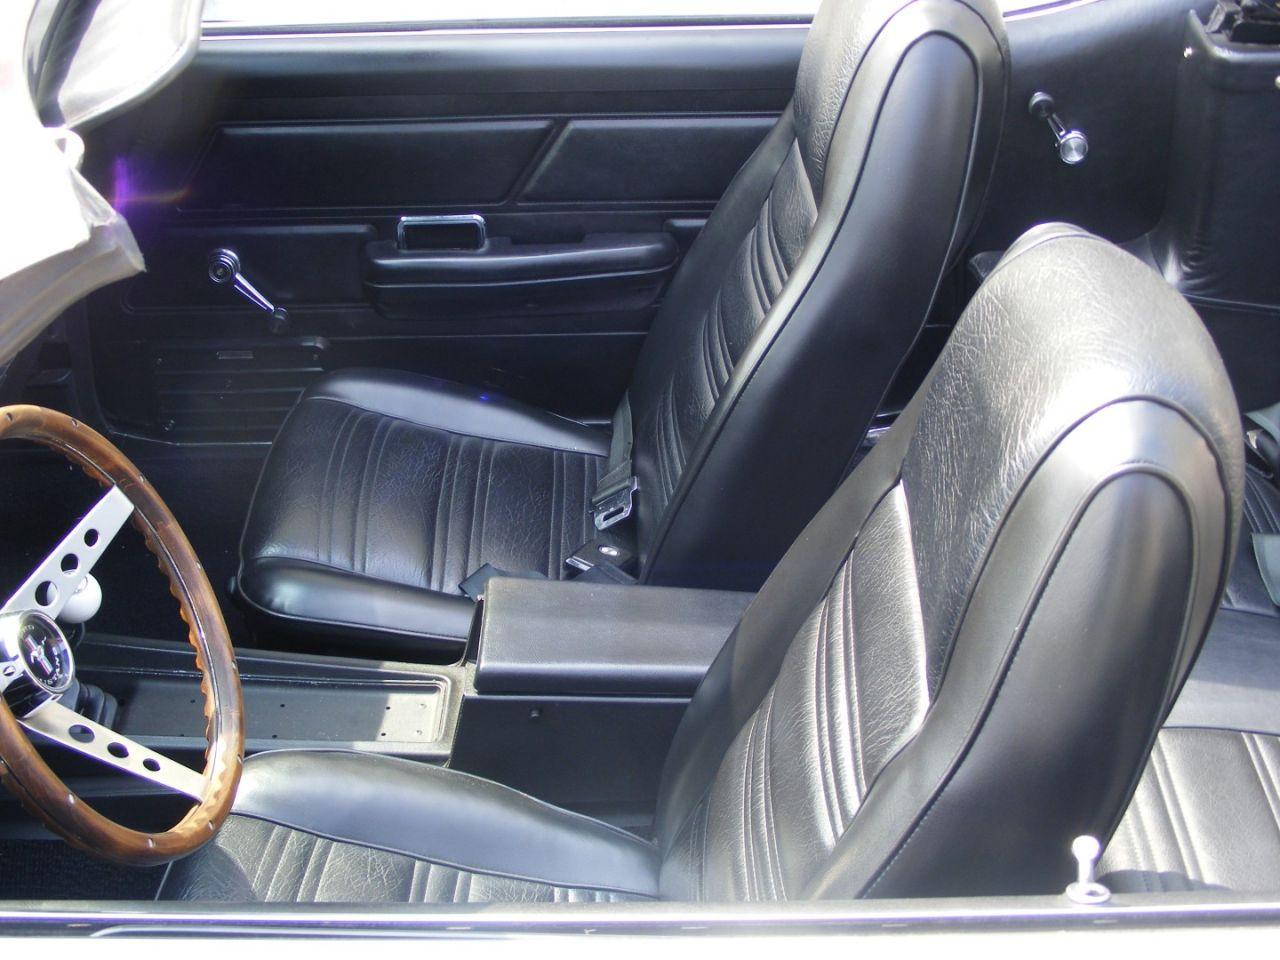 retro garage importateur voiture am ricaine must 1970. Black Bedroom Furniture Sets. Home Design Ideas